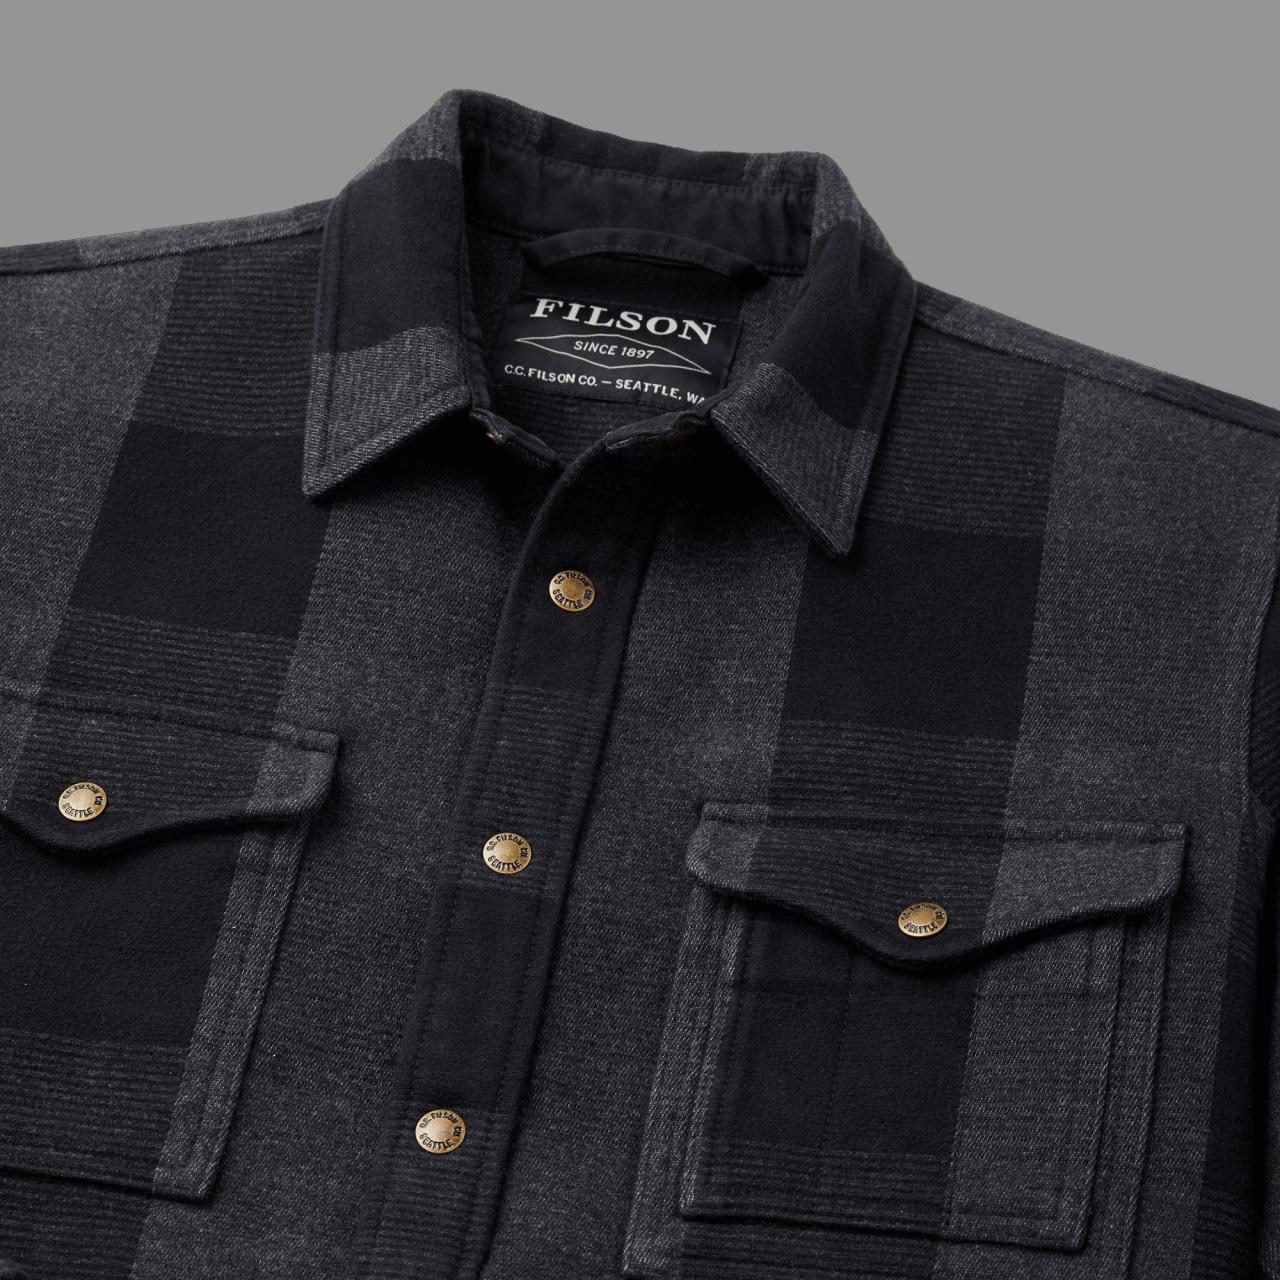 Filson Beartooth Camp Jacket - black gray